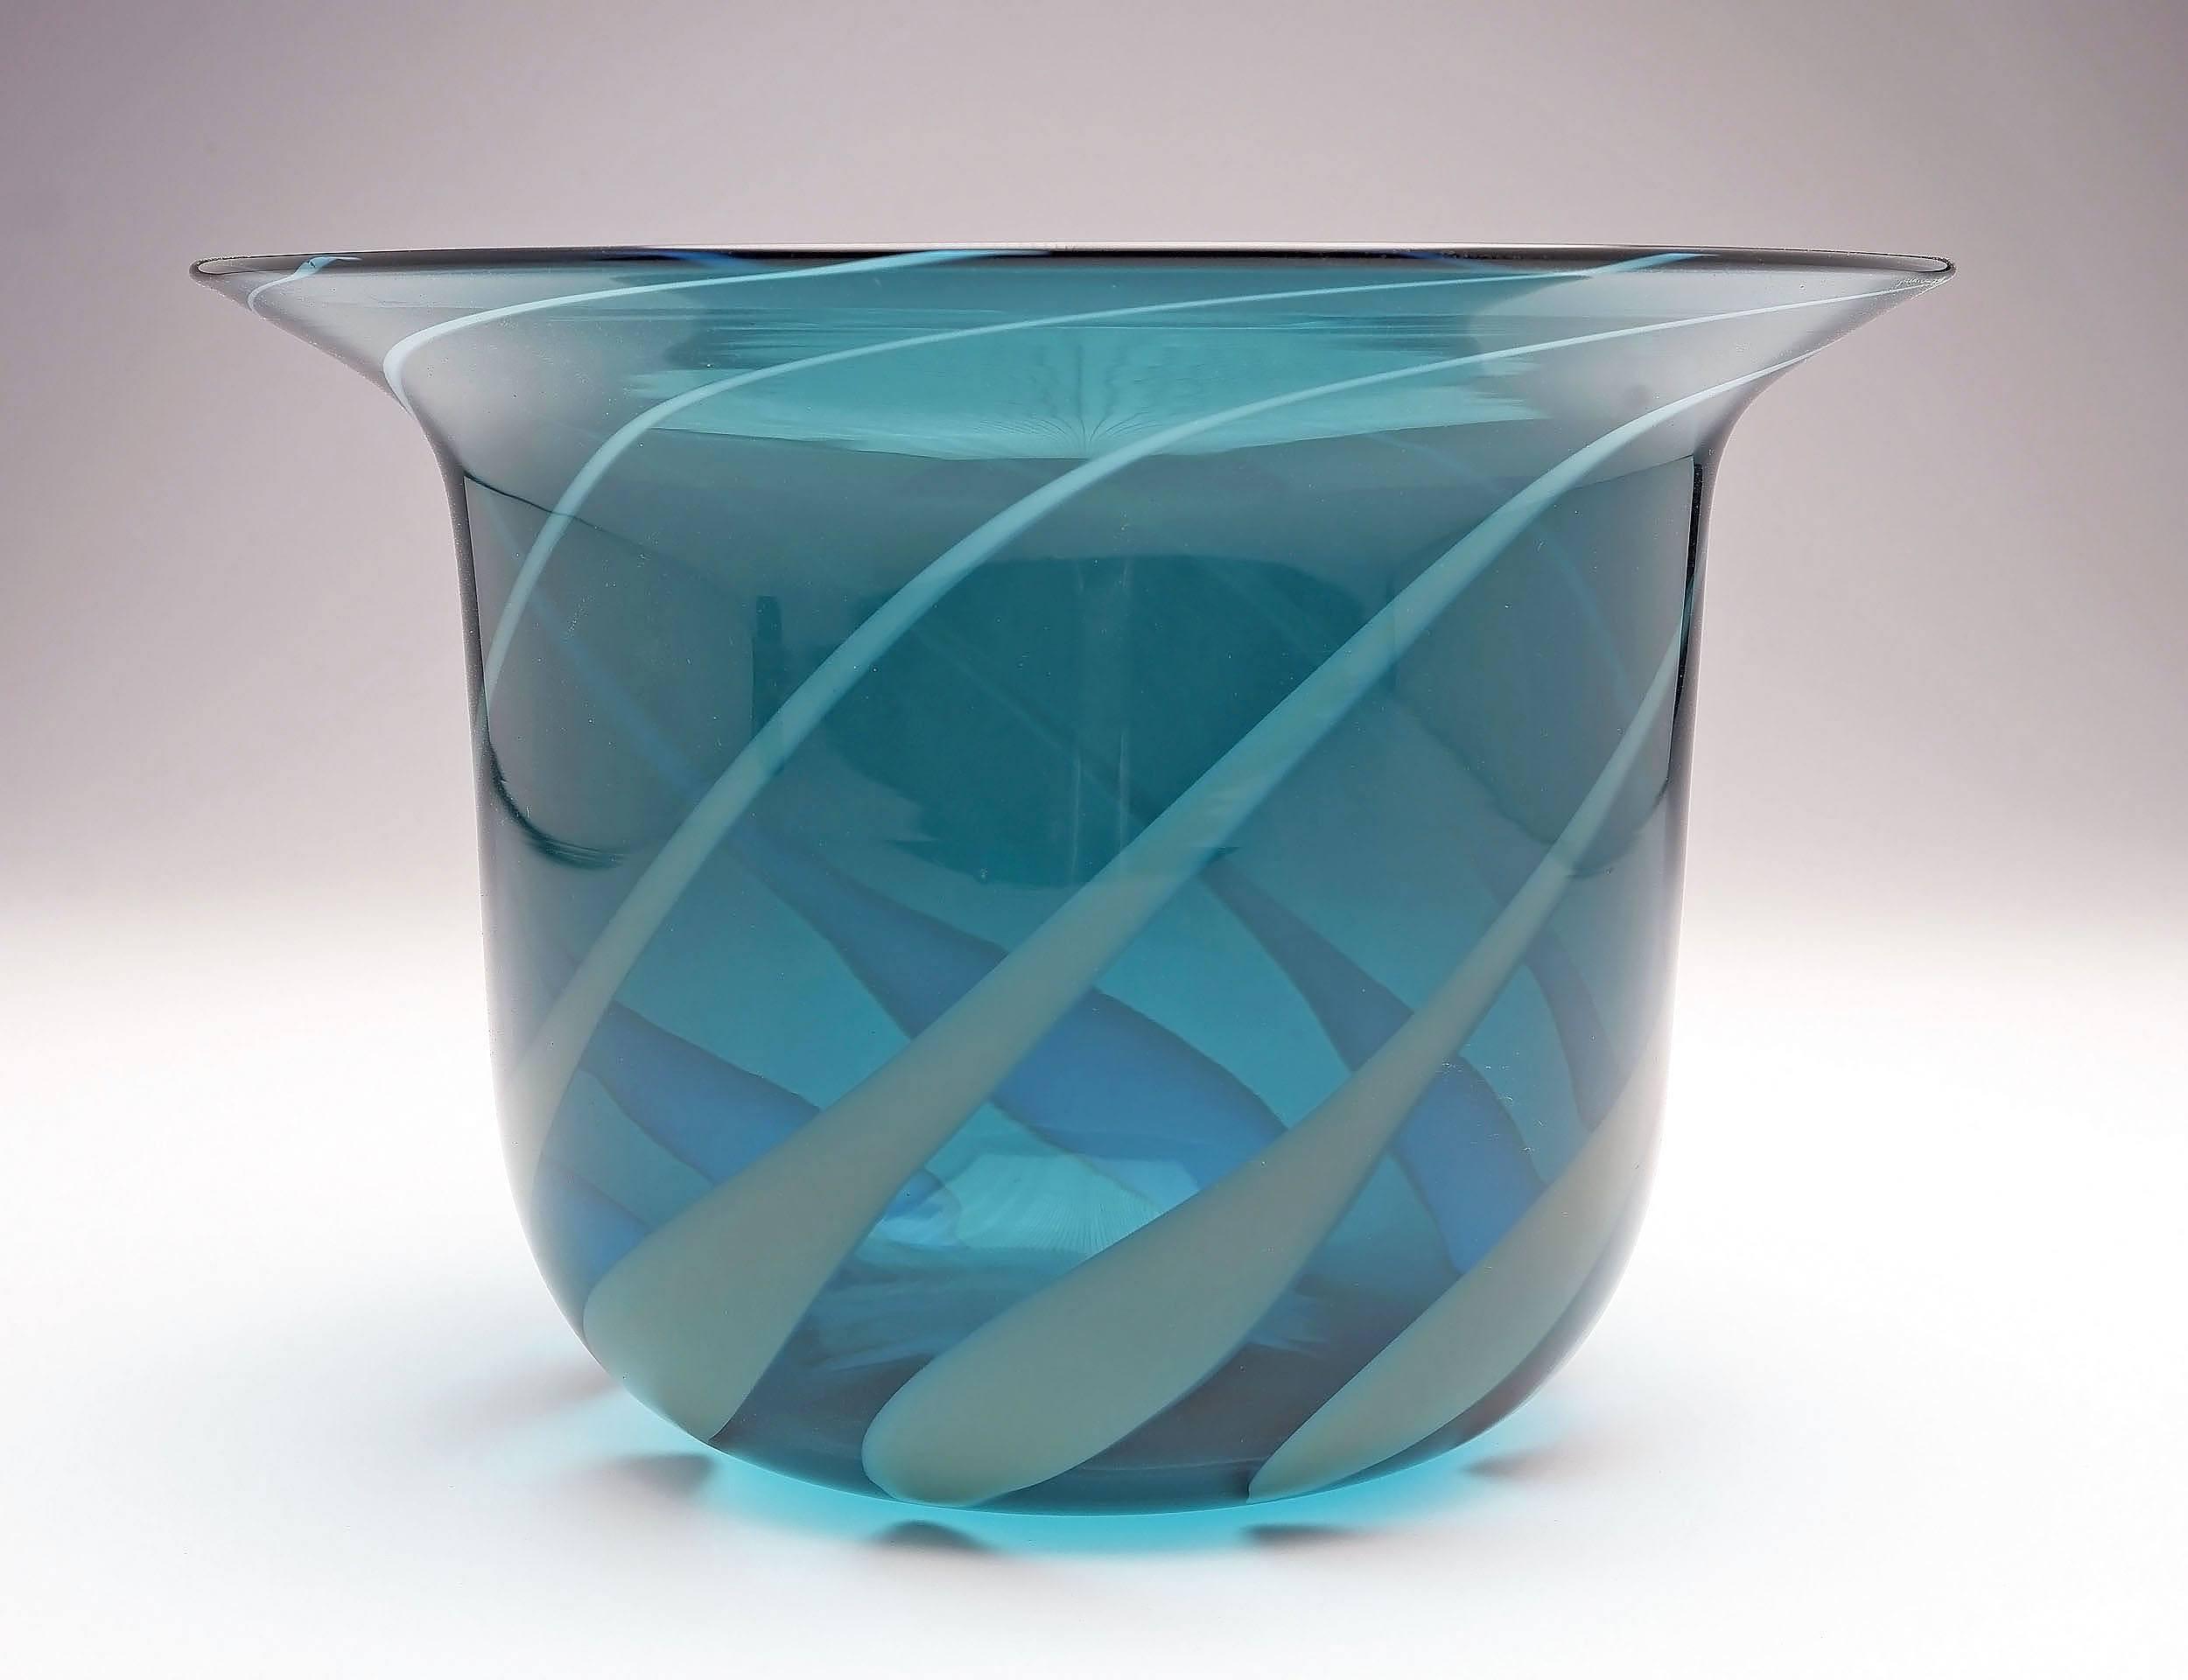 'Rare Italian Venini Glass Flared Bowl Designed by Tapio Wirkkala'